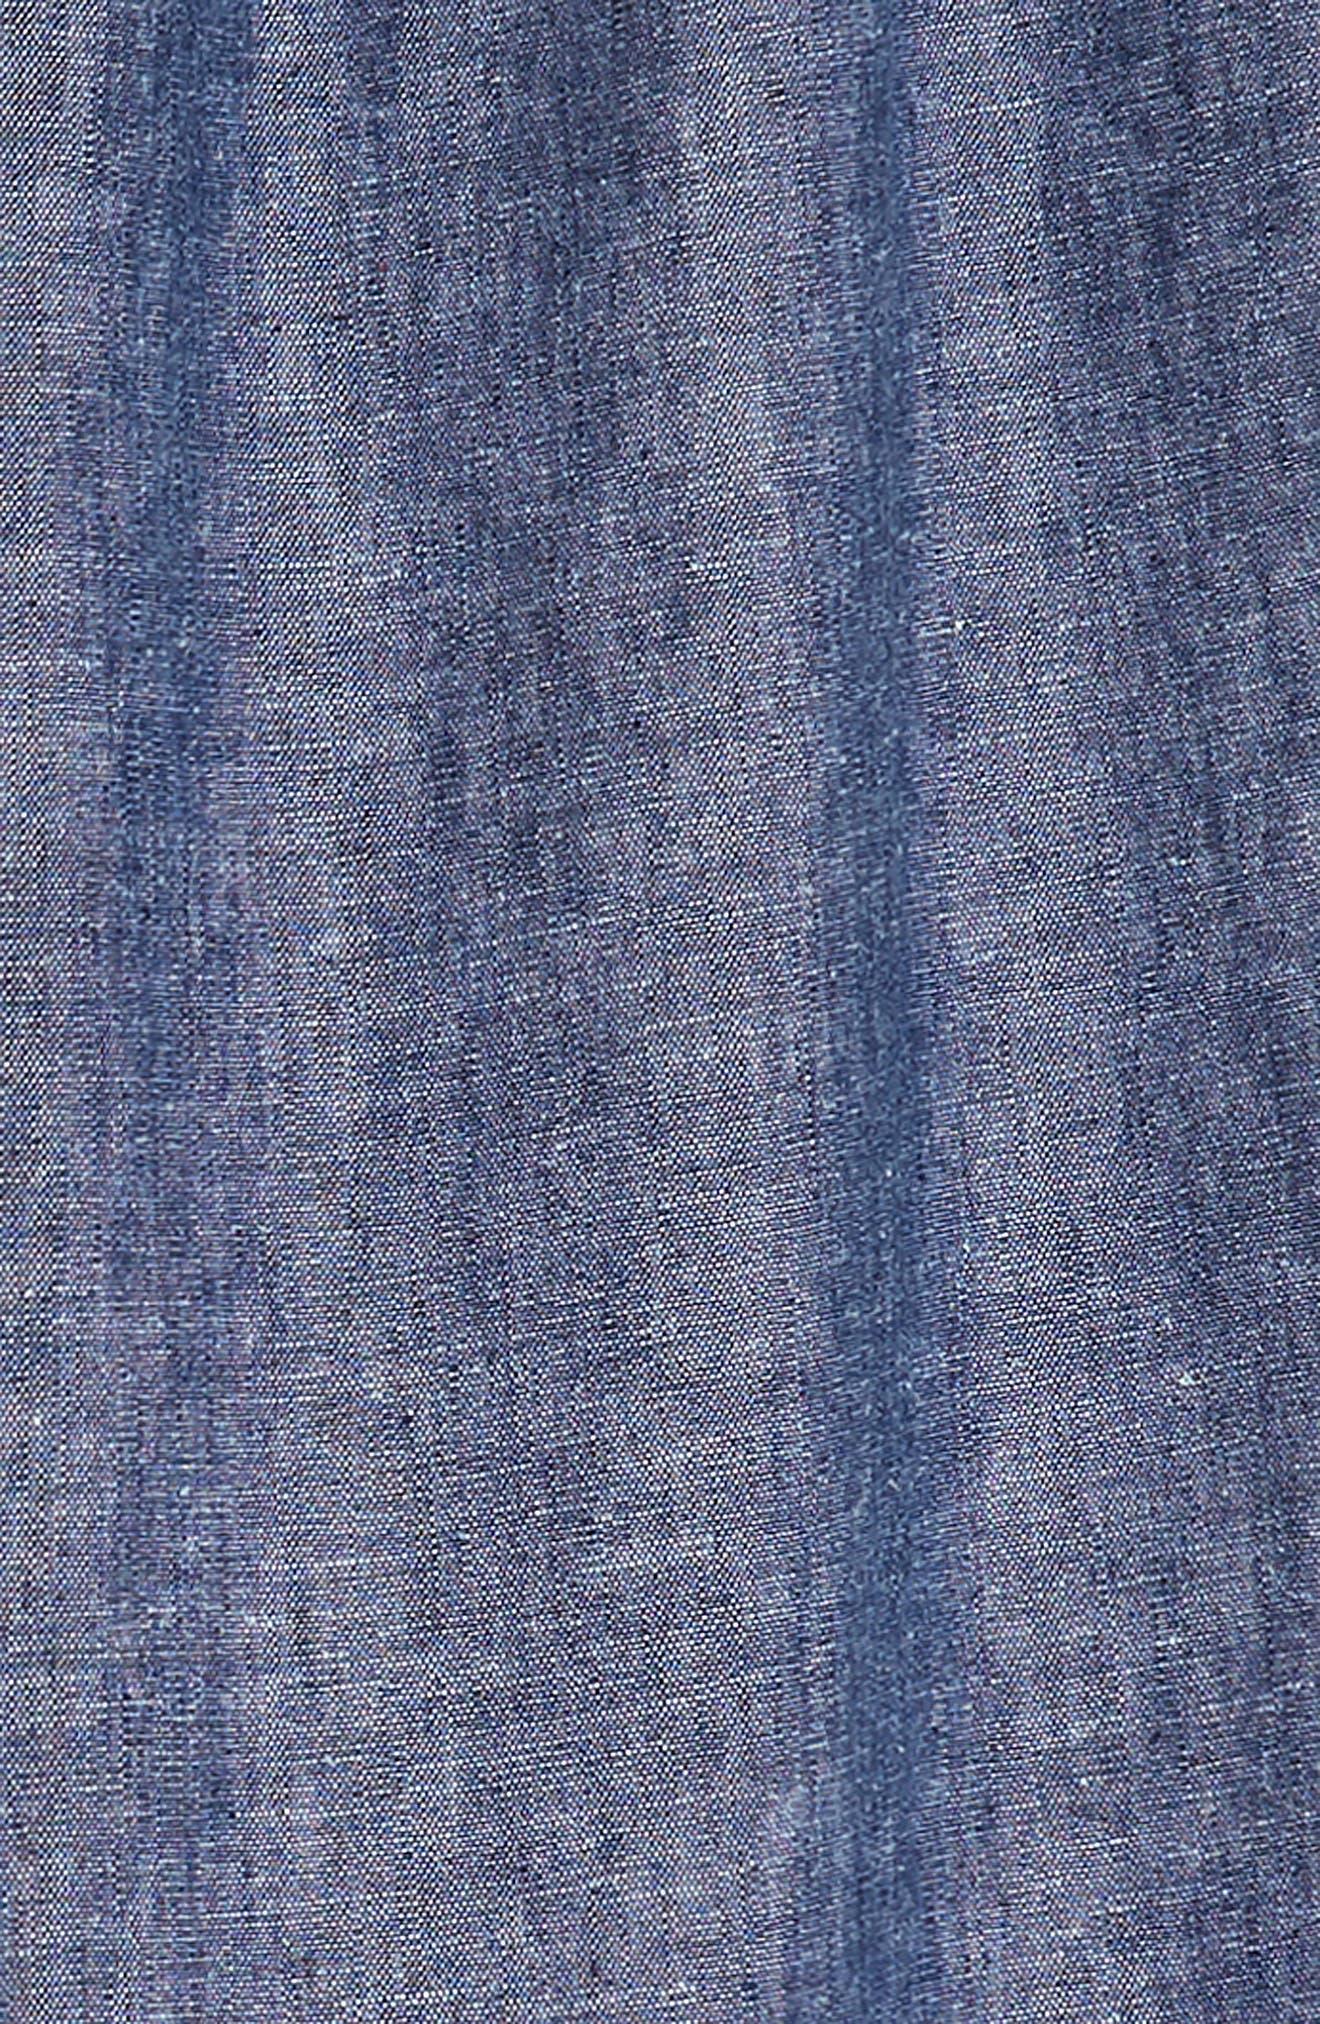 Chambray Ruffle Neck Dress,                             Alternate thumbnail 3, color,                             Indigo